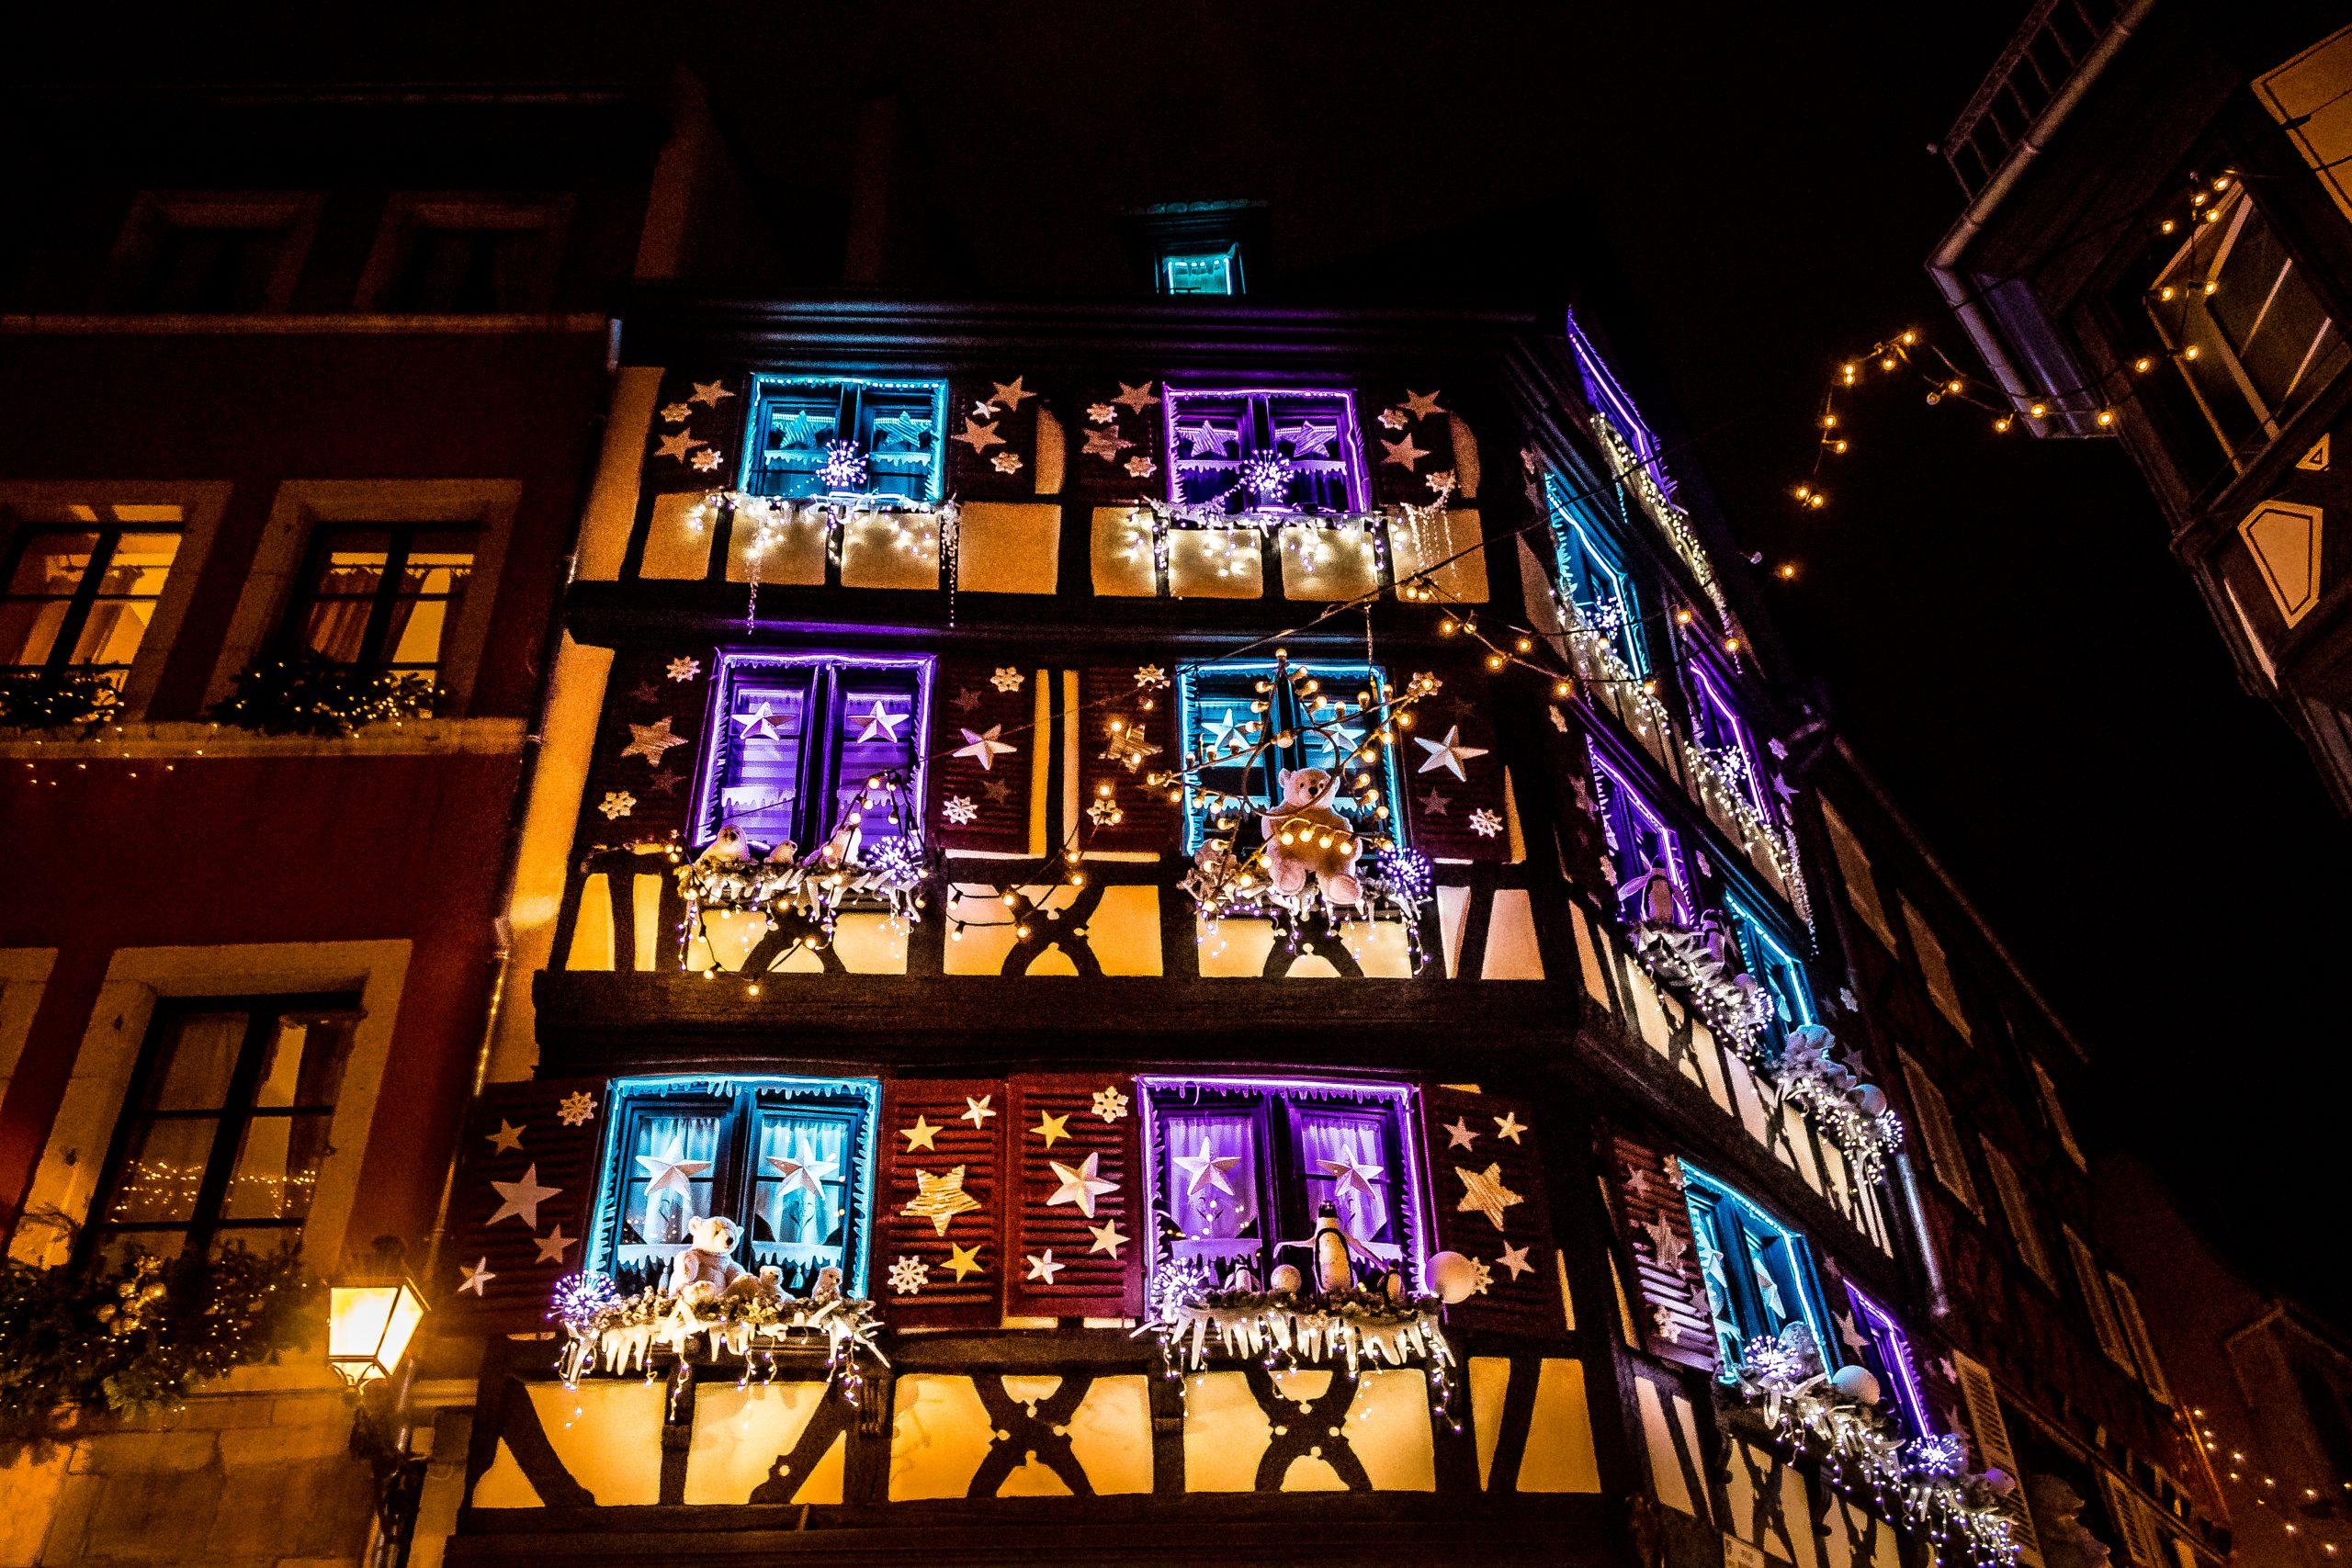 Magie de Noël de Colmar - Alsace - Marie Naudon